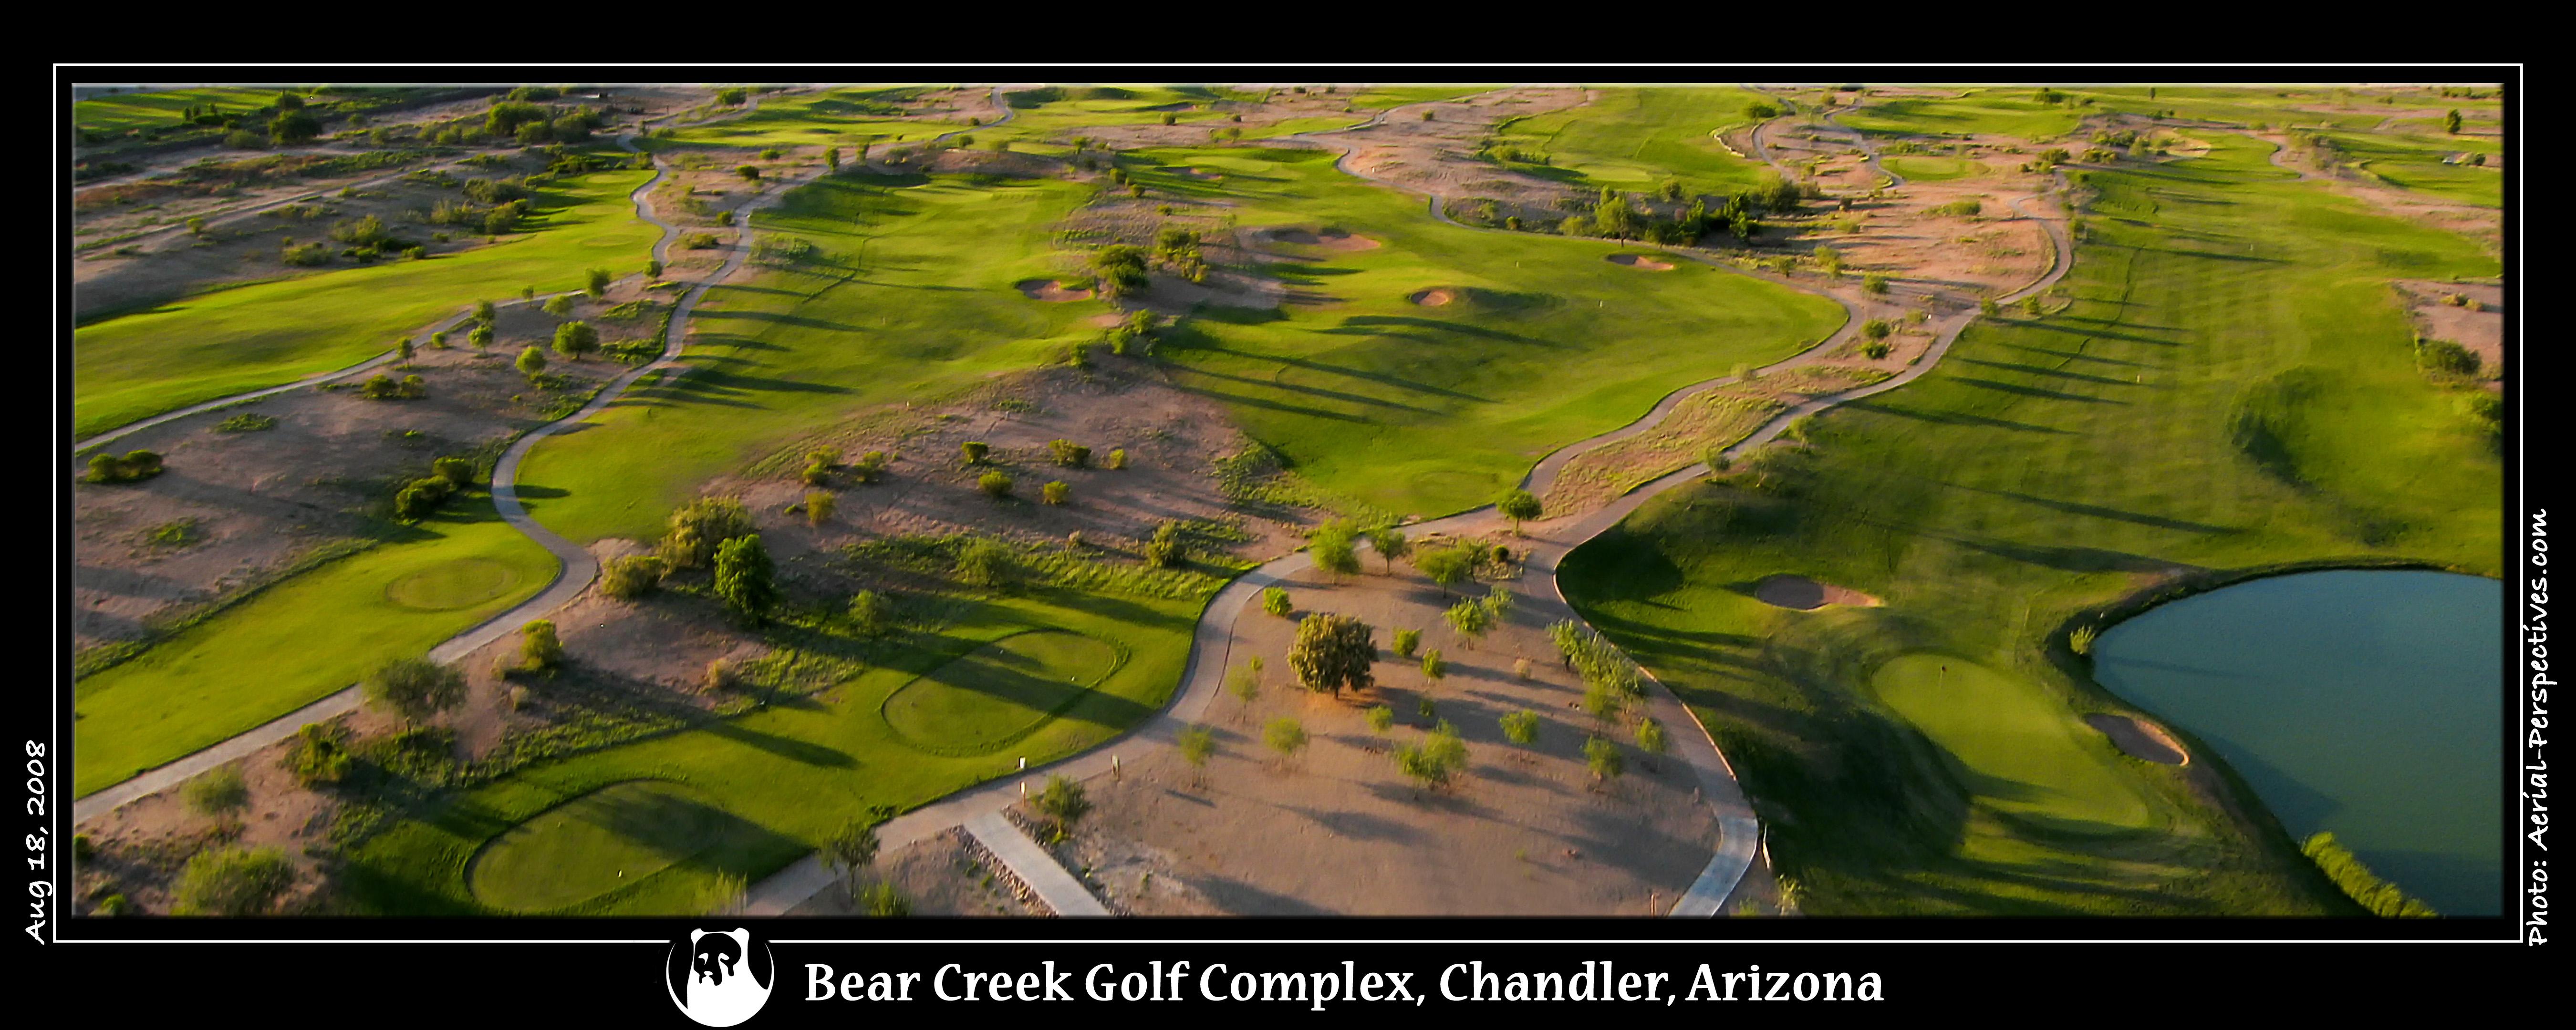 Bear Creek Golf Complex image 1